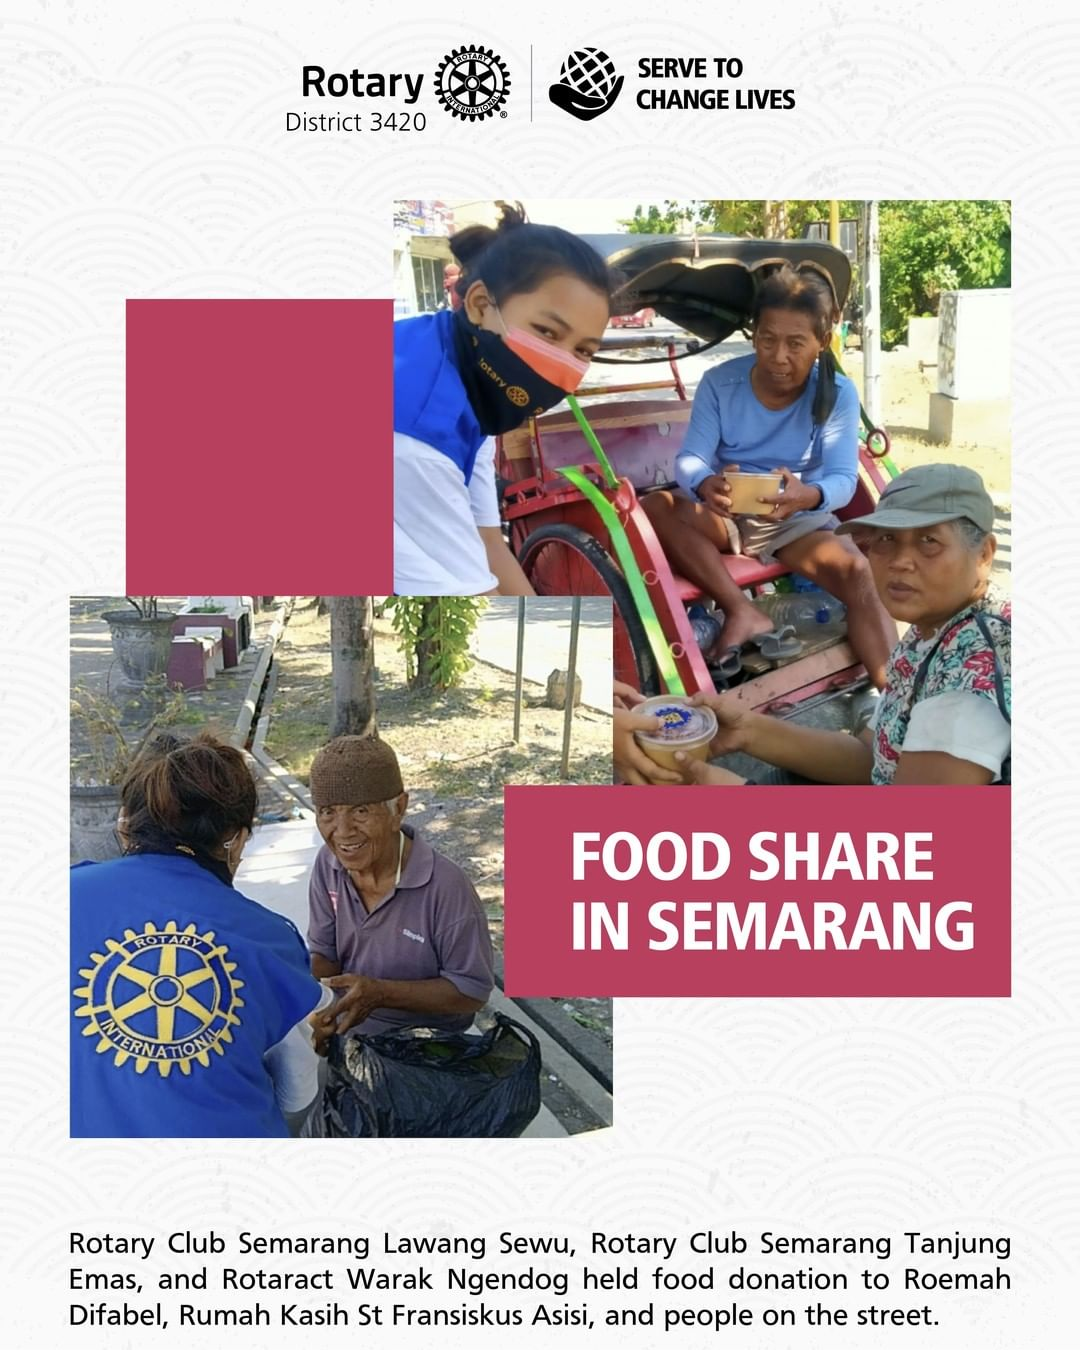 Food Share in Semarang